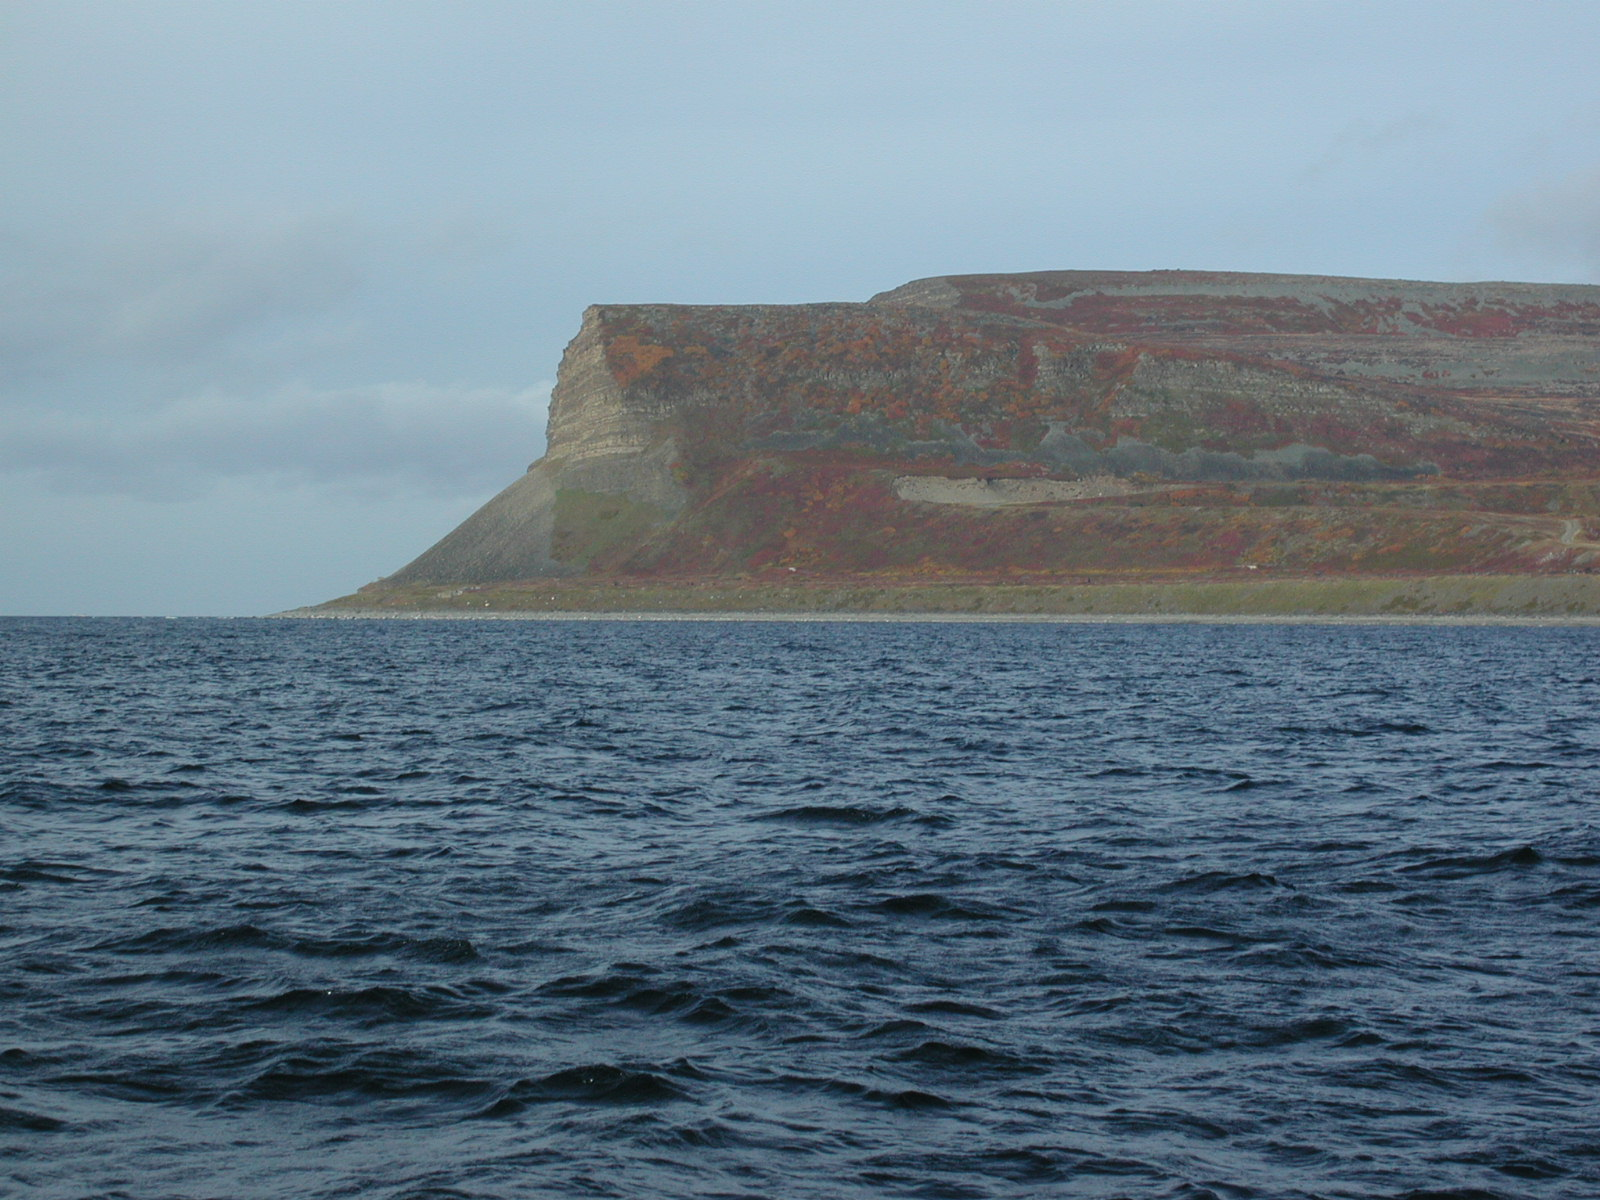 Kildin Island